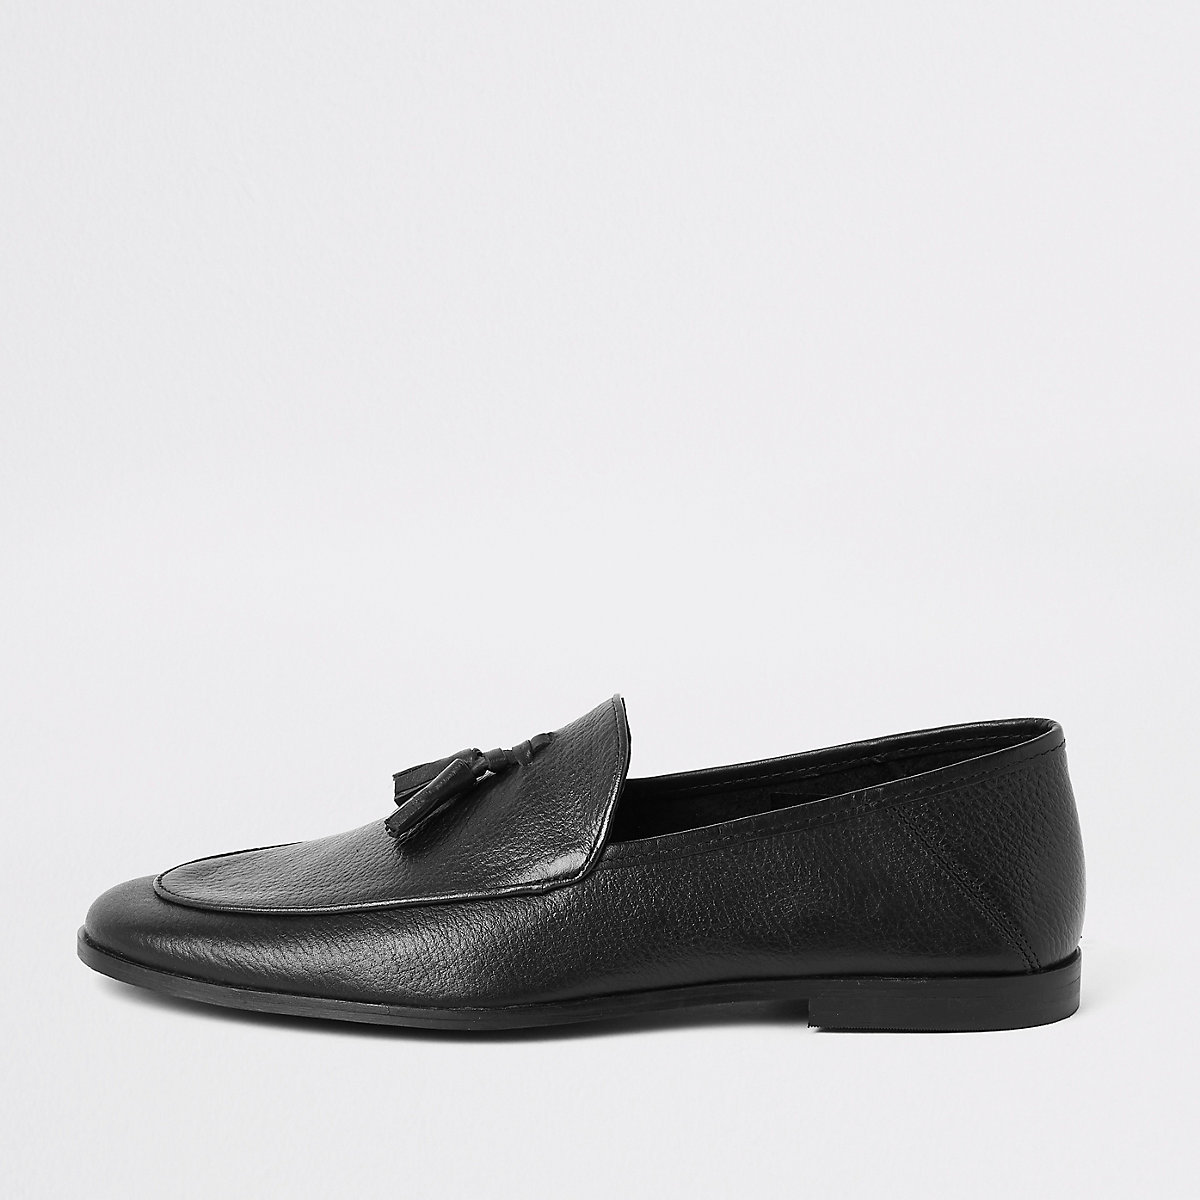 Black textured leather tassel loafer